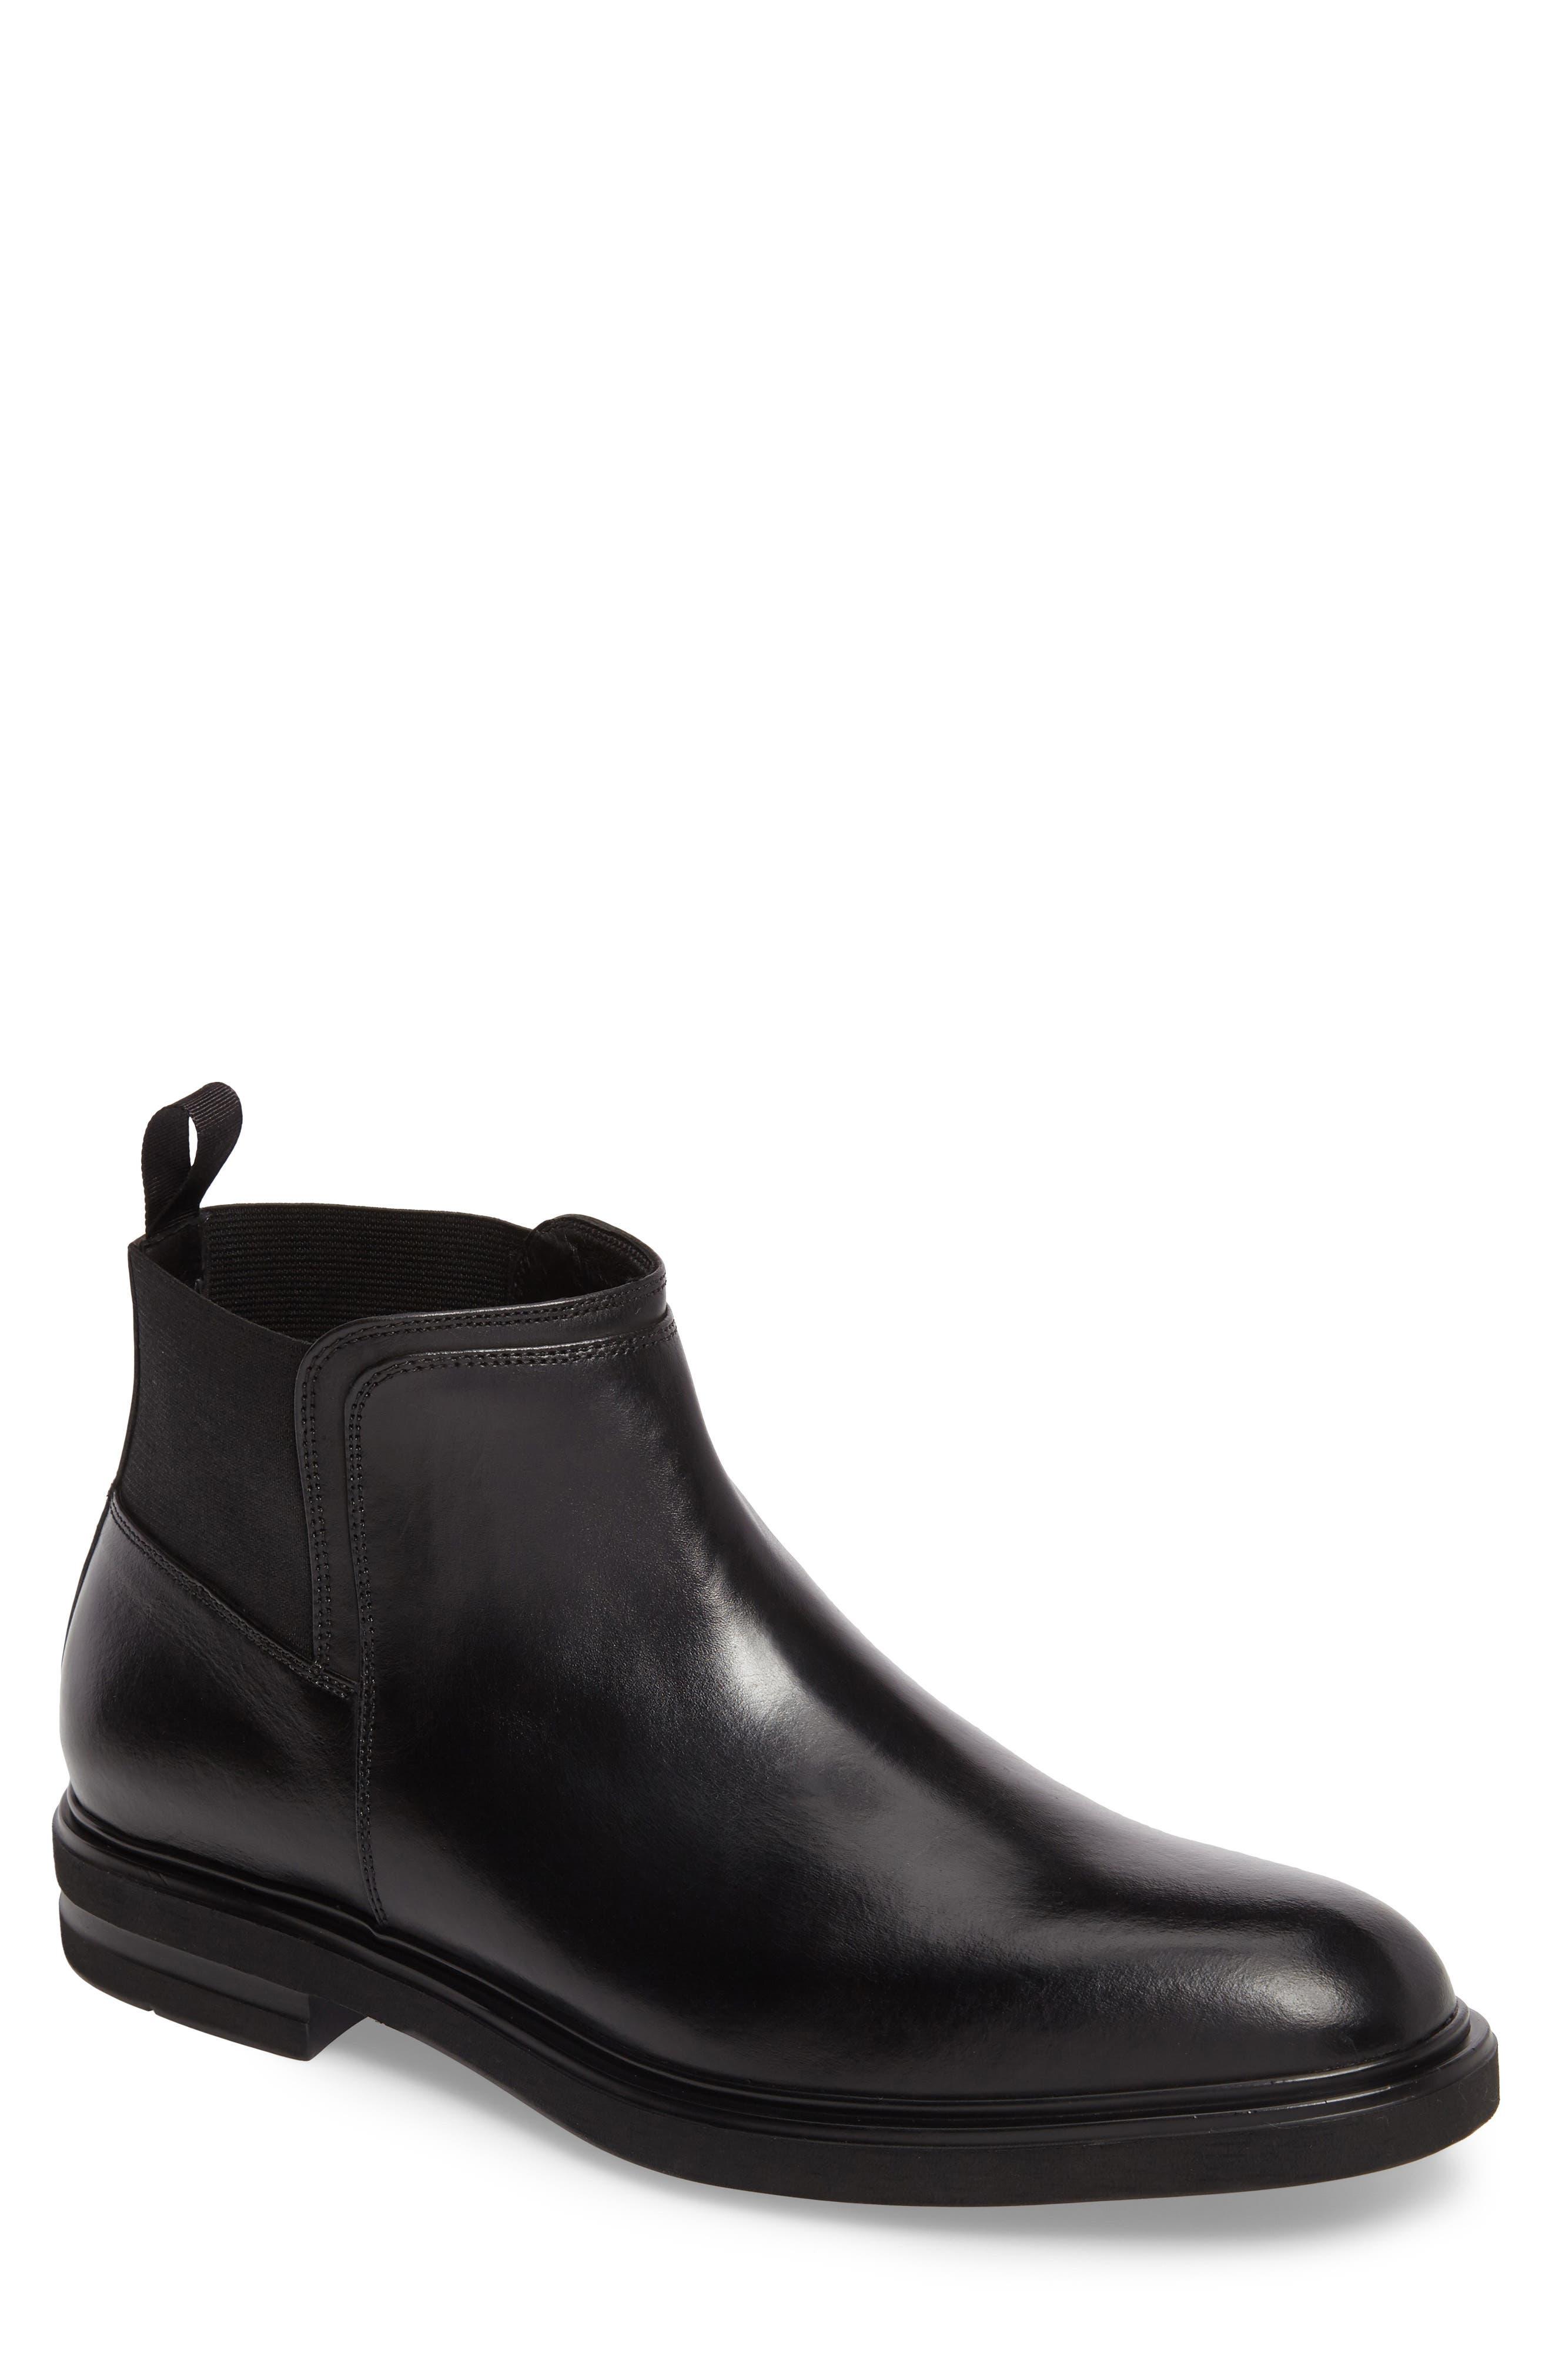 Enrico Chelsea Boot,                         Main,                         color,